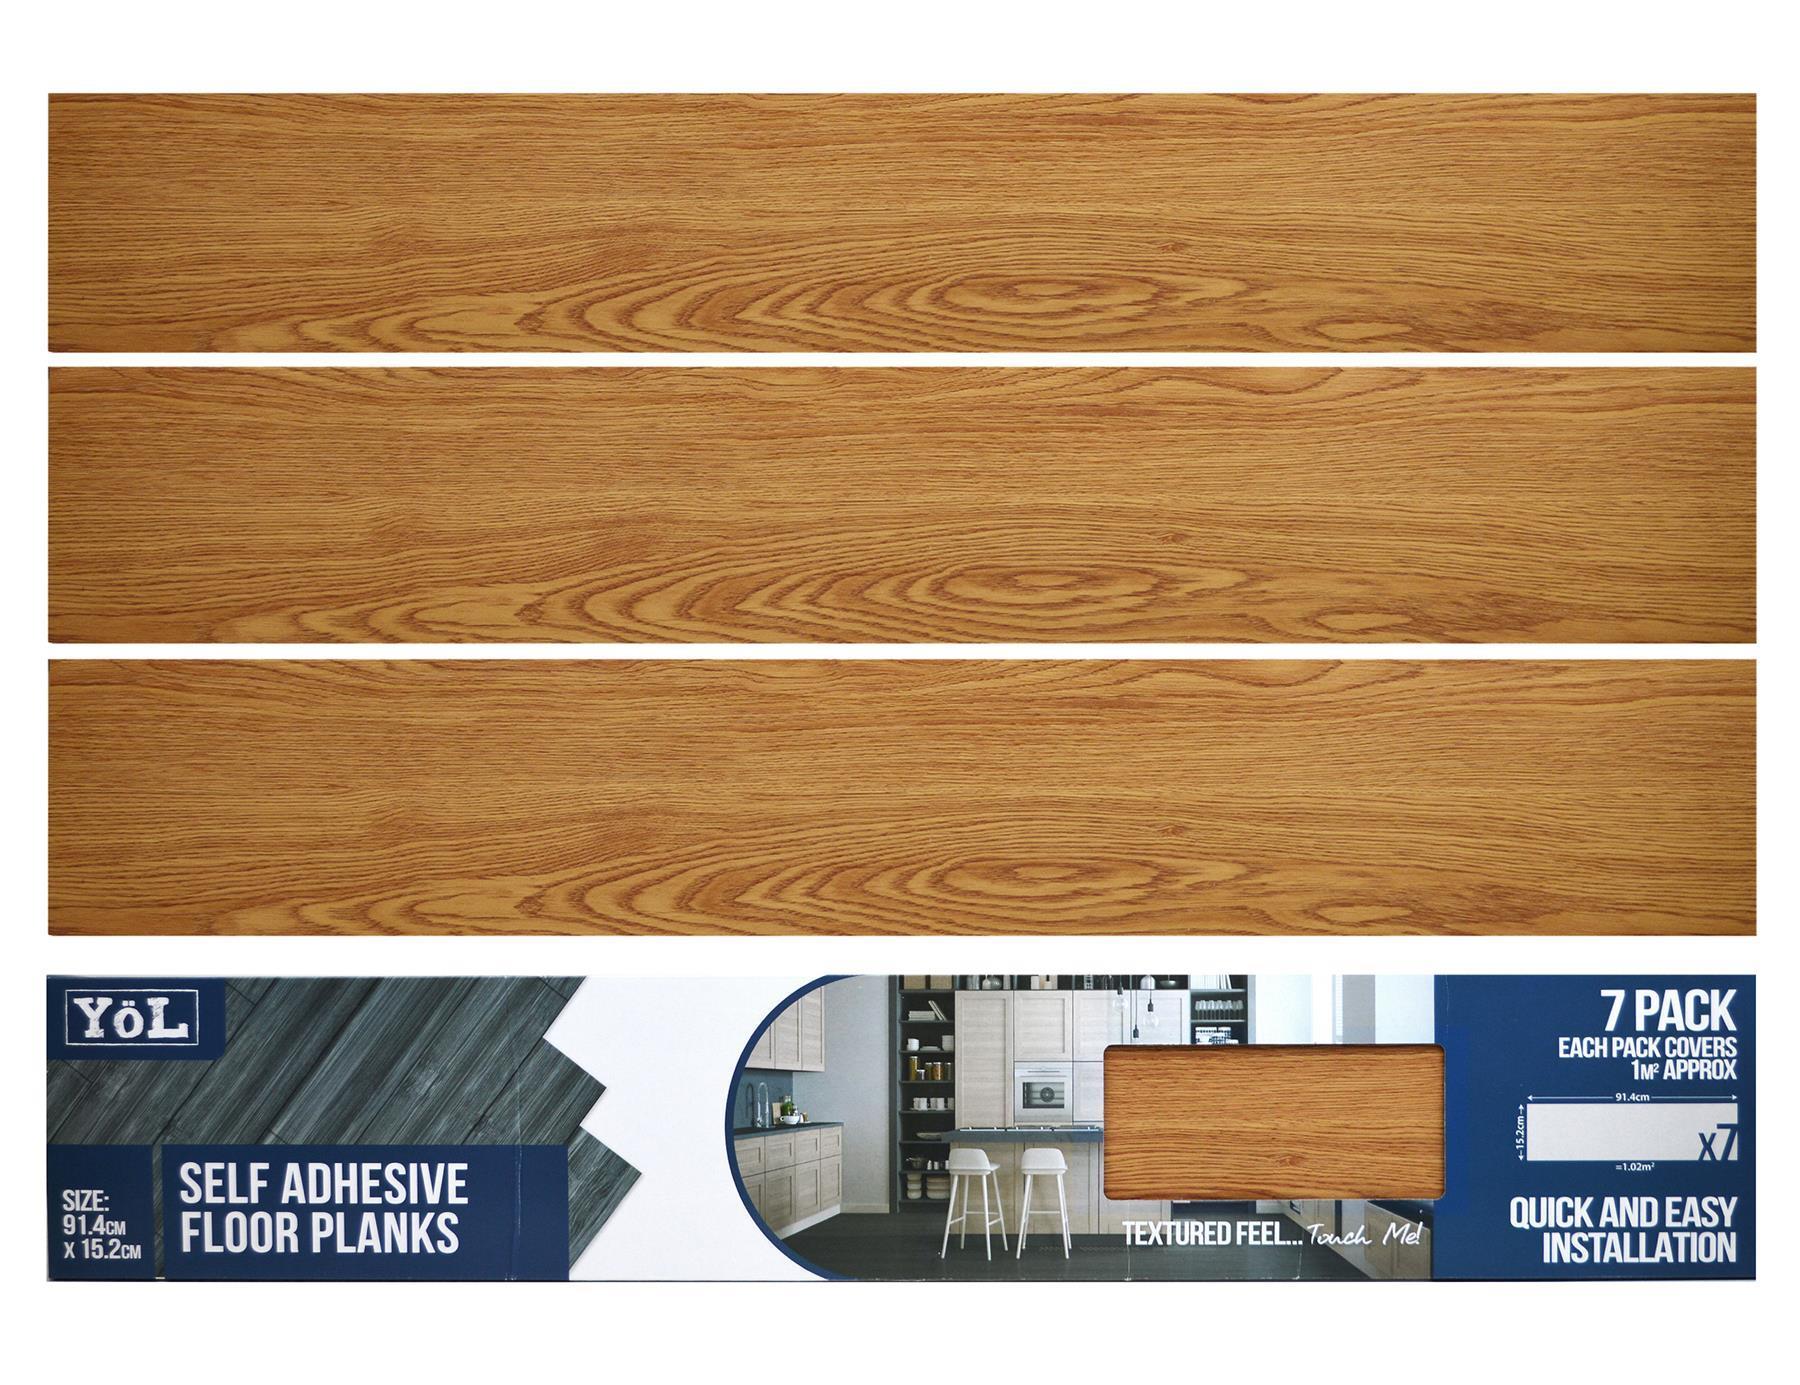 thumbnail 18 - Floor Planks Tiles Self Adhesive Vinyl Brown Wood Flooring Kitchen Bathroom